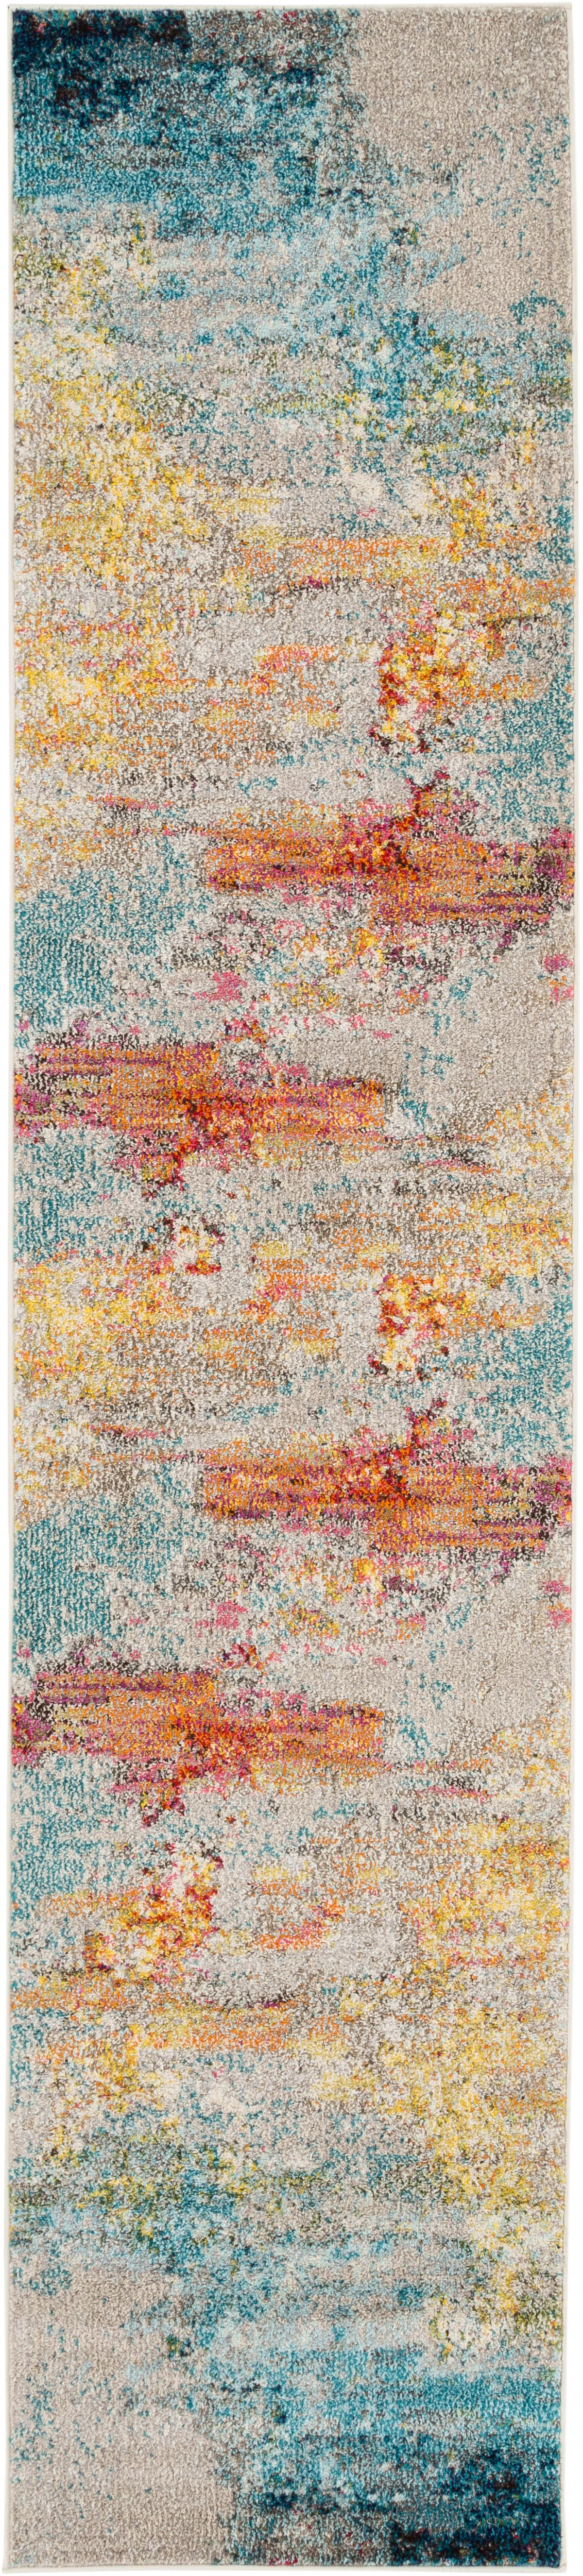 Passatoia a fantasia in polipropilene Celestial, Retro: juta, Multicolore, Larg. 70 x Lung. 305 cm